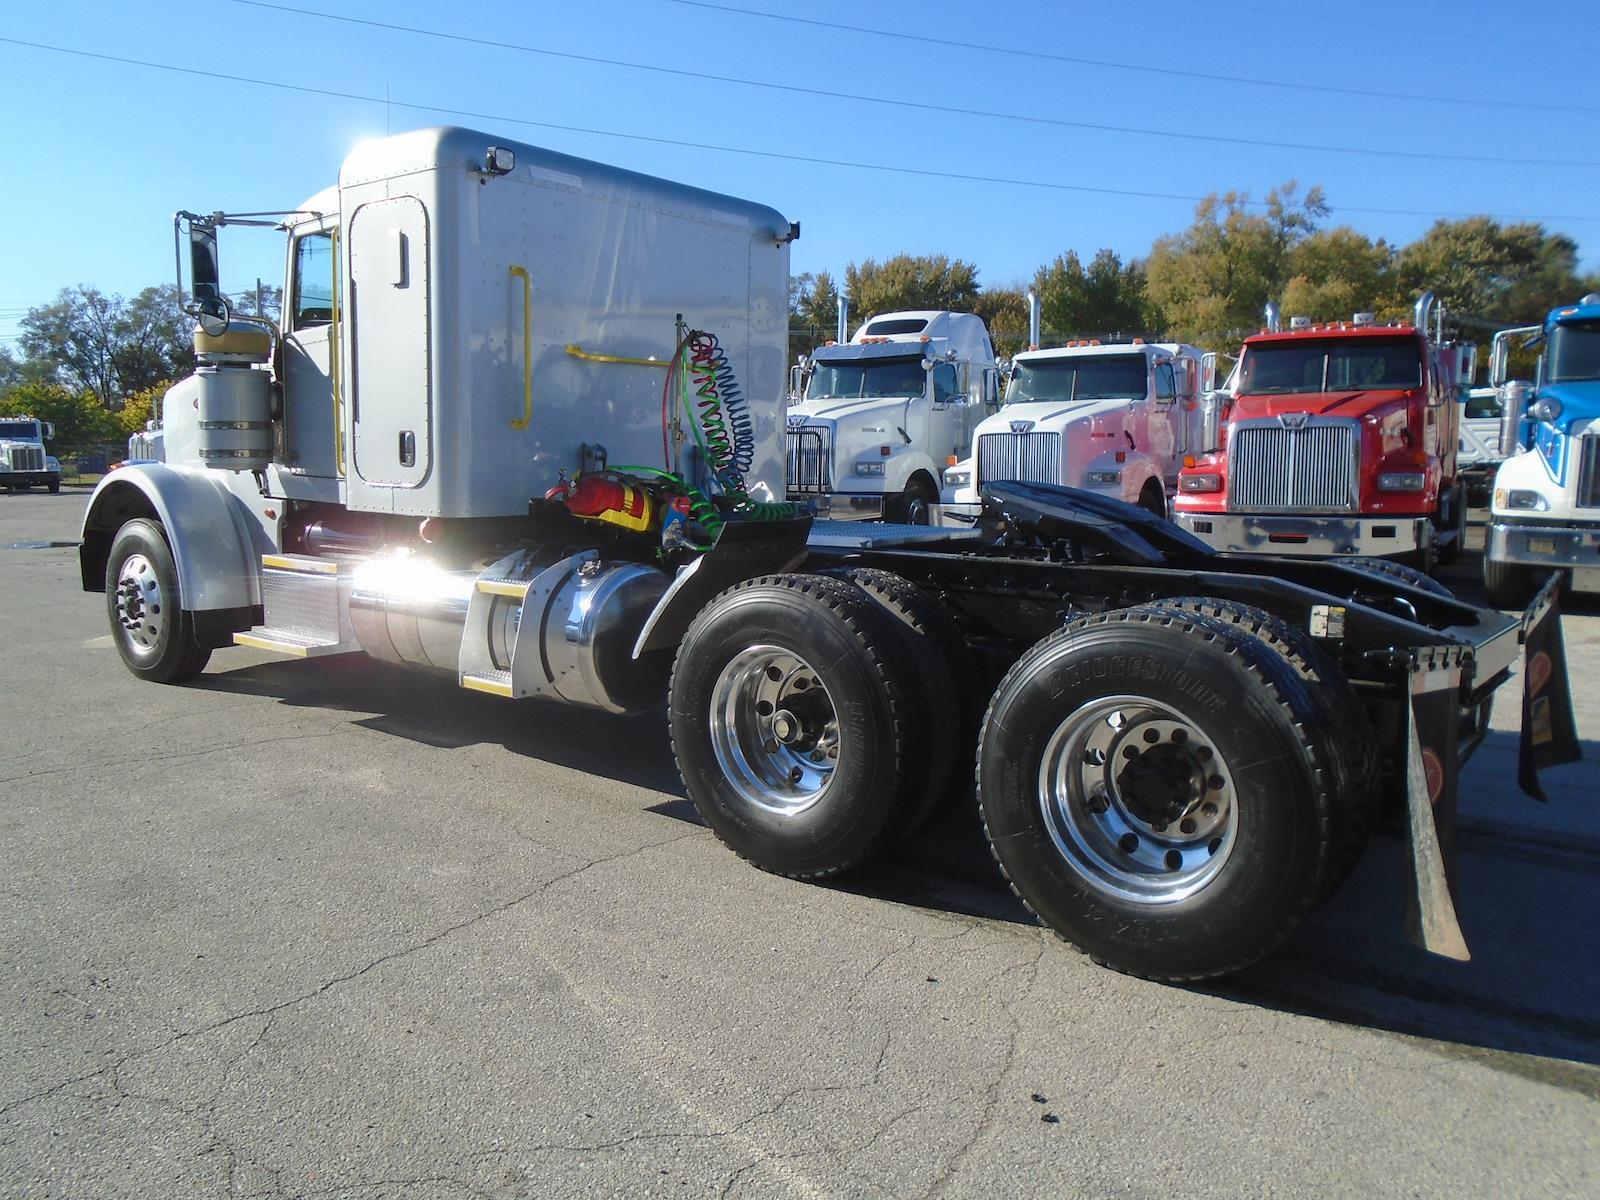 2014 Peterbilt 367 Sleeper Cab 6x4, Tractor #88623 - photo 1